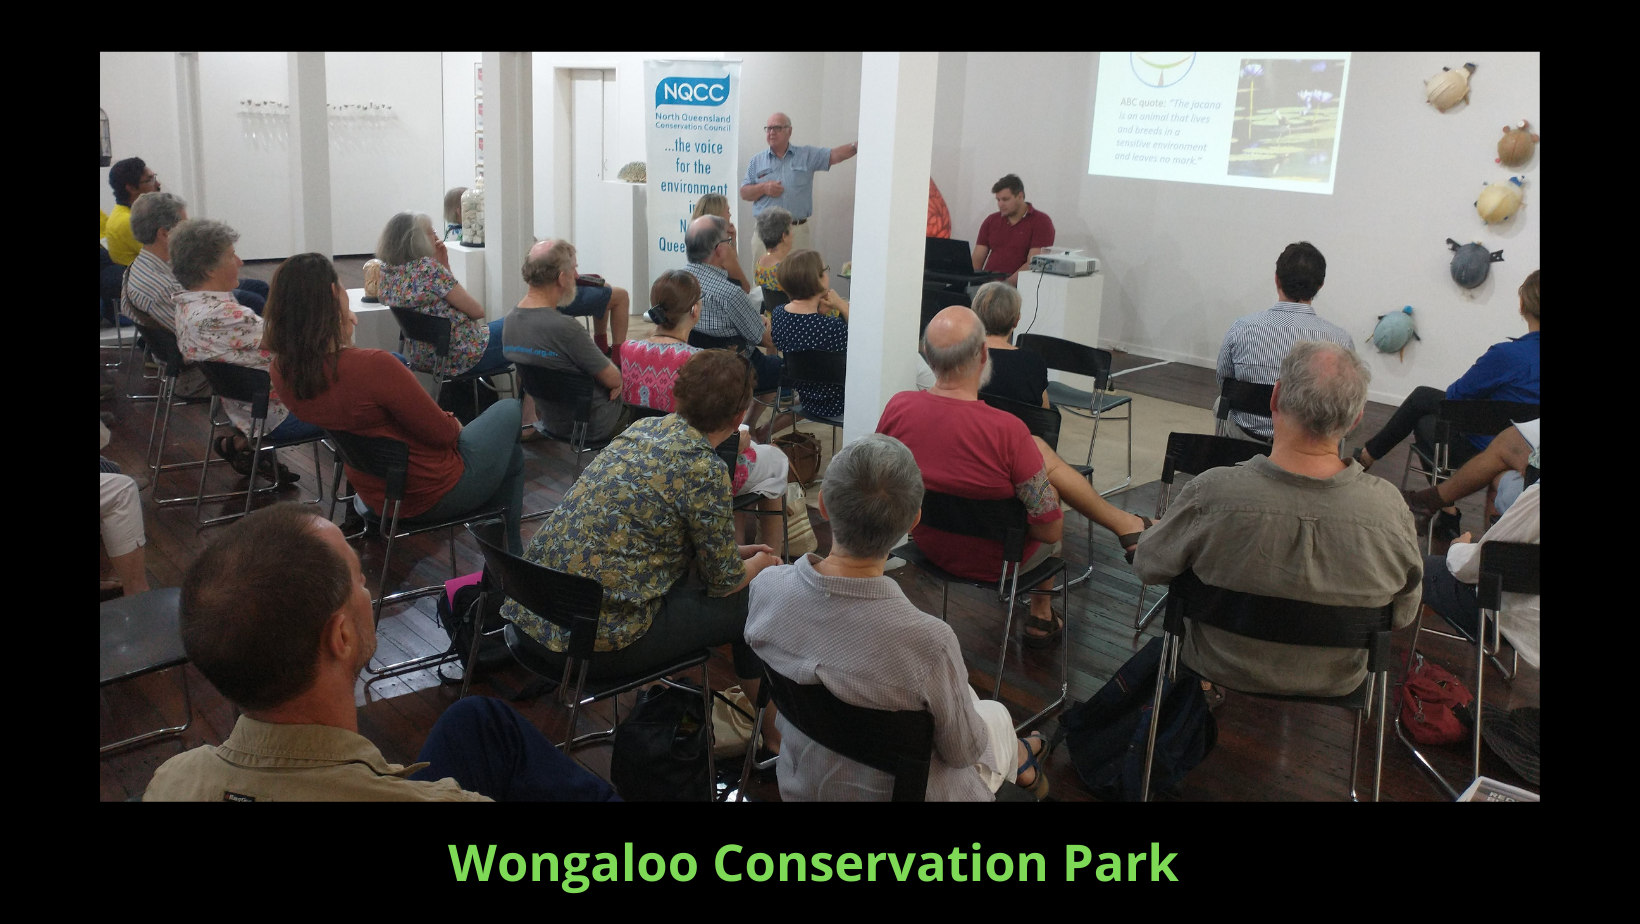 Mark Stoneman from Wongaloo Wetlands